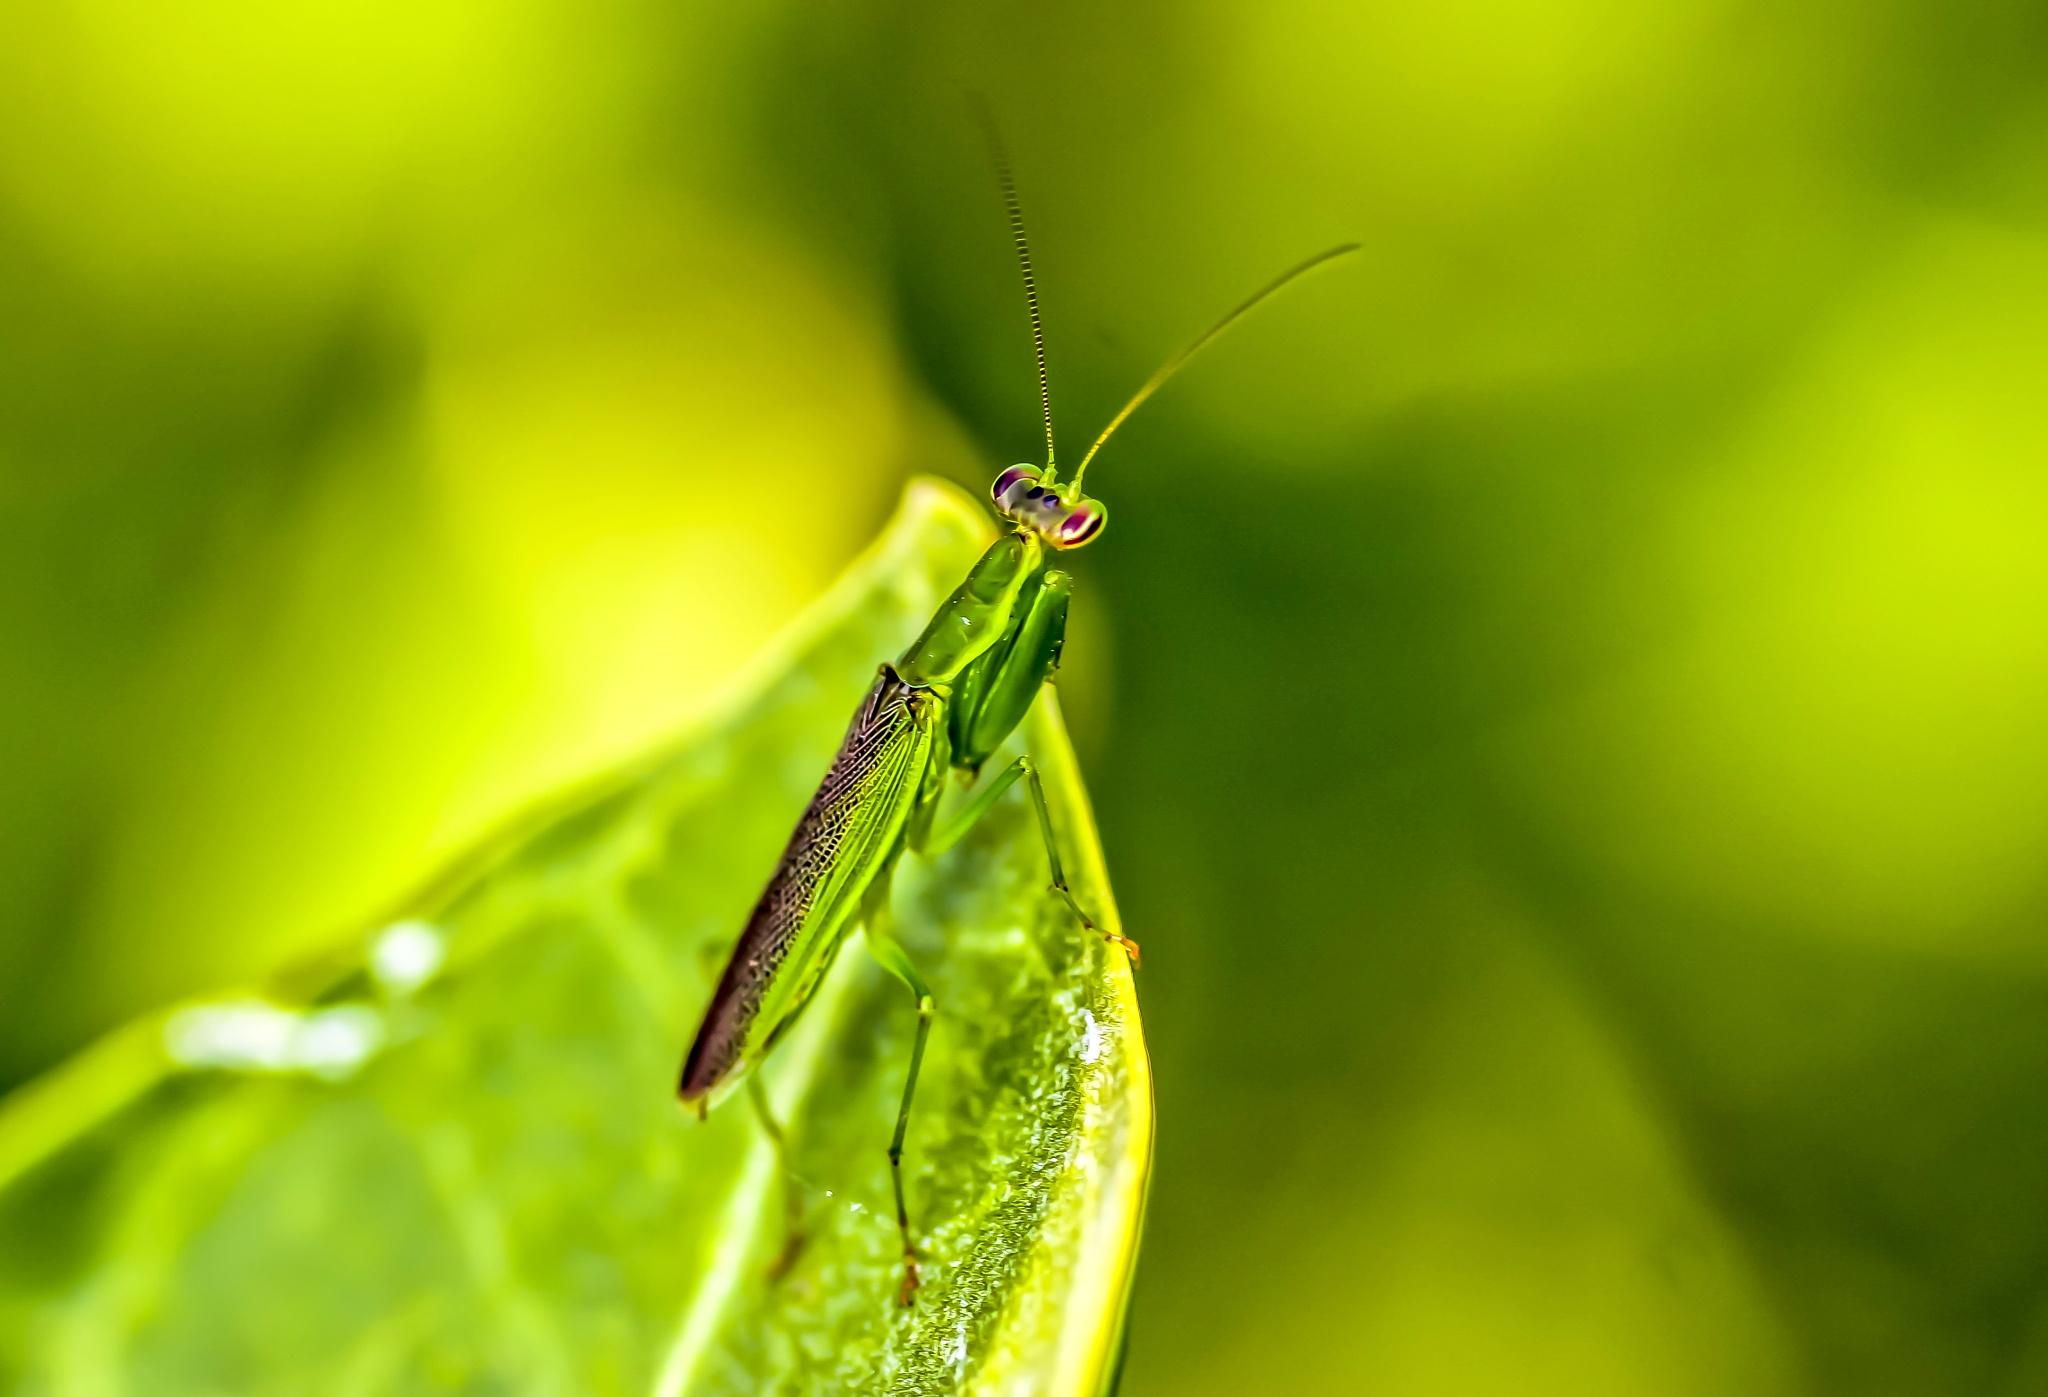 Mantis by Sayeeram Rengaraj